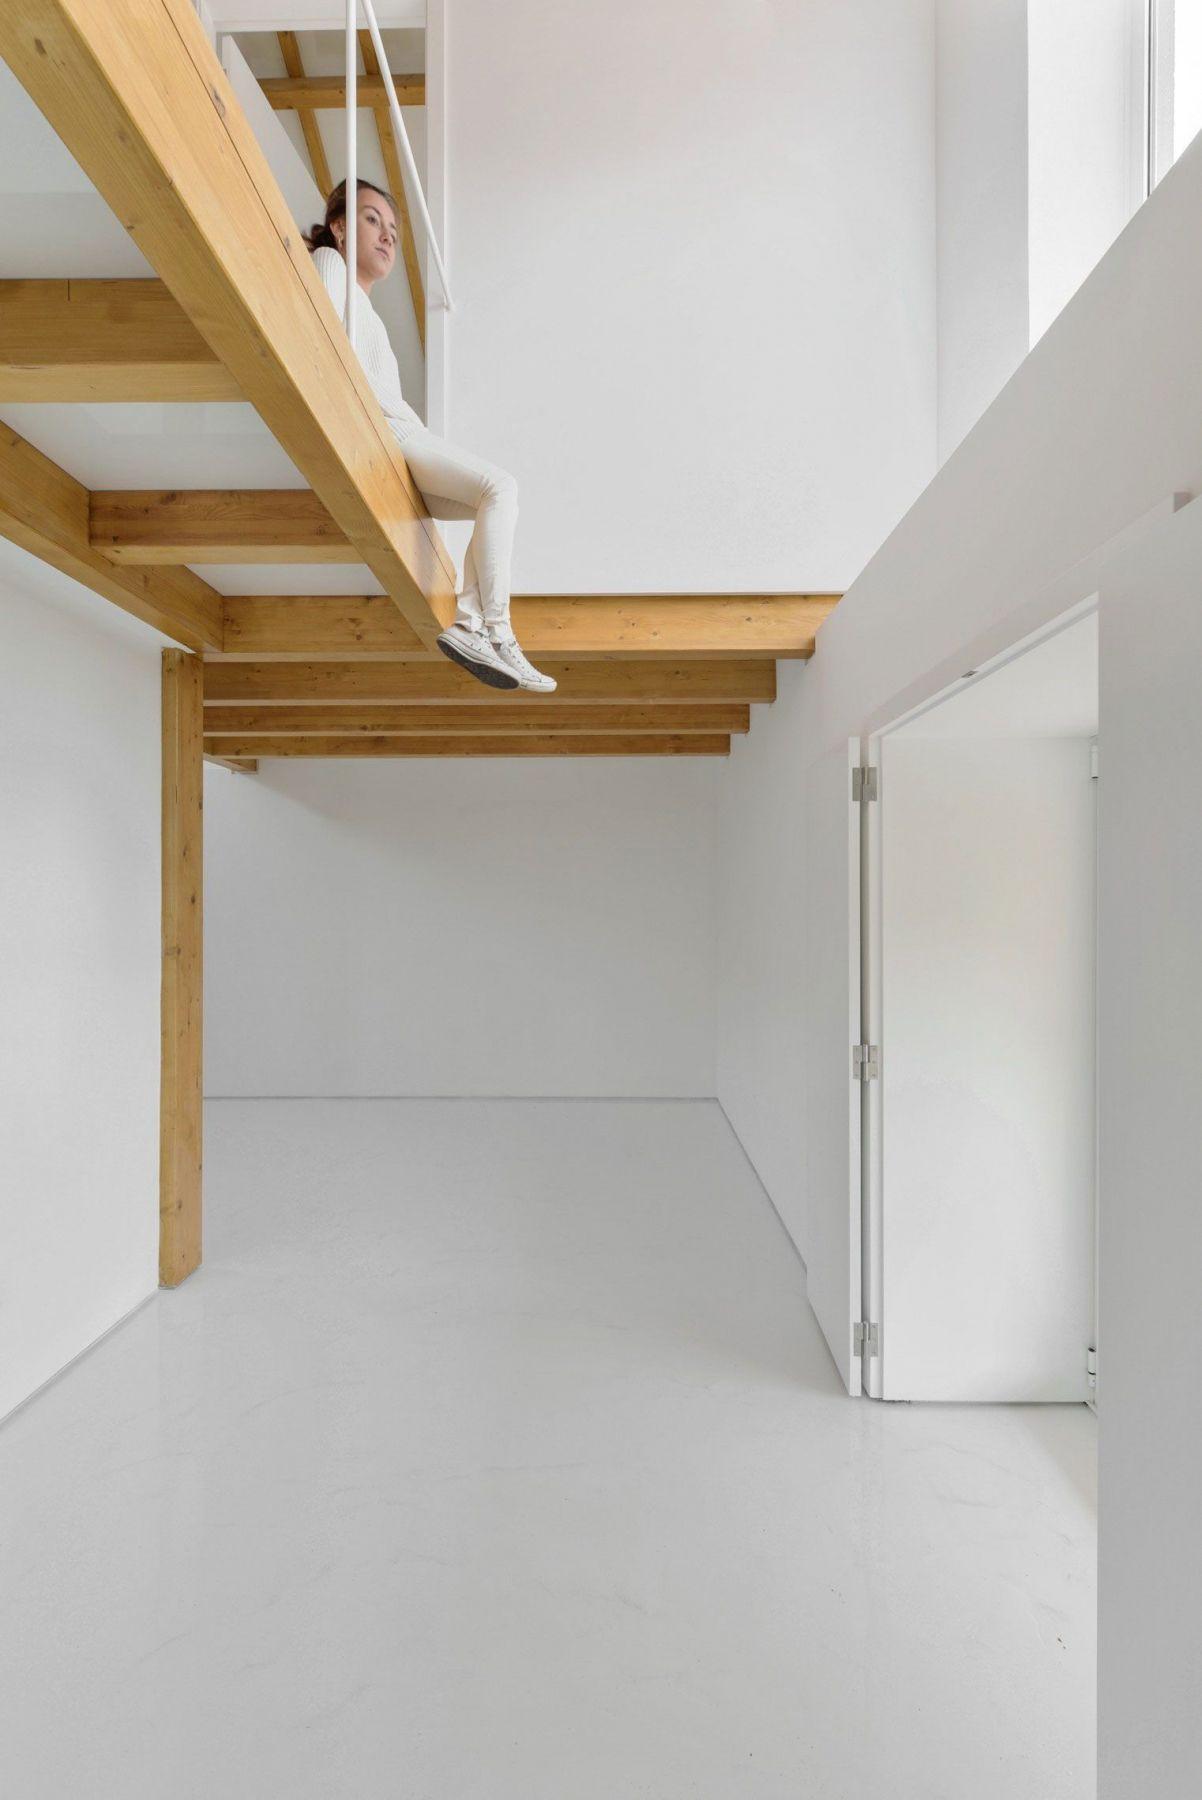 Portugal interior wood design and architecture